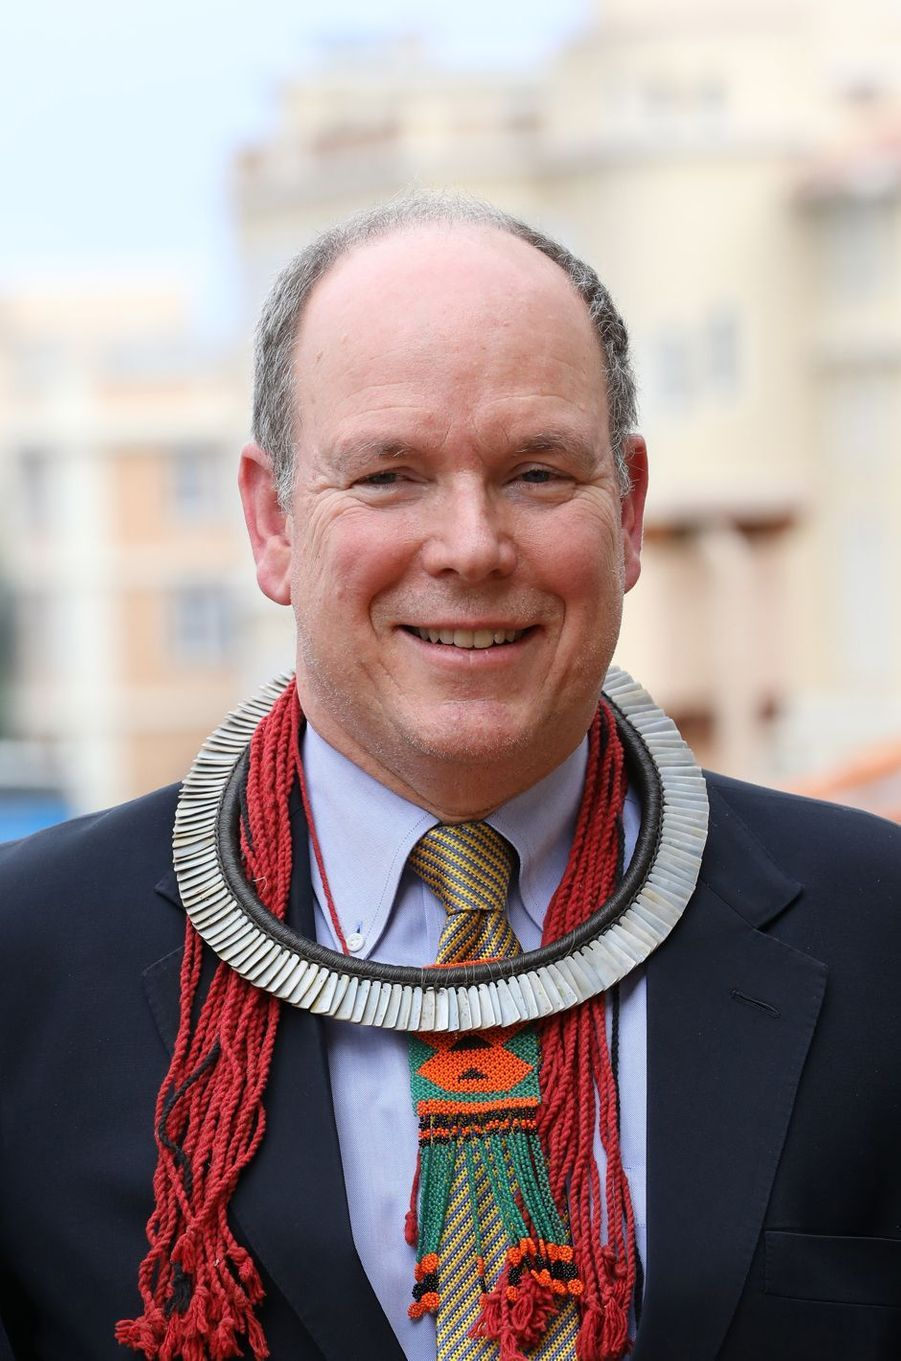 Le prince Albert II de Monaco à Monaco, le 23 mai 2019